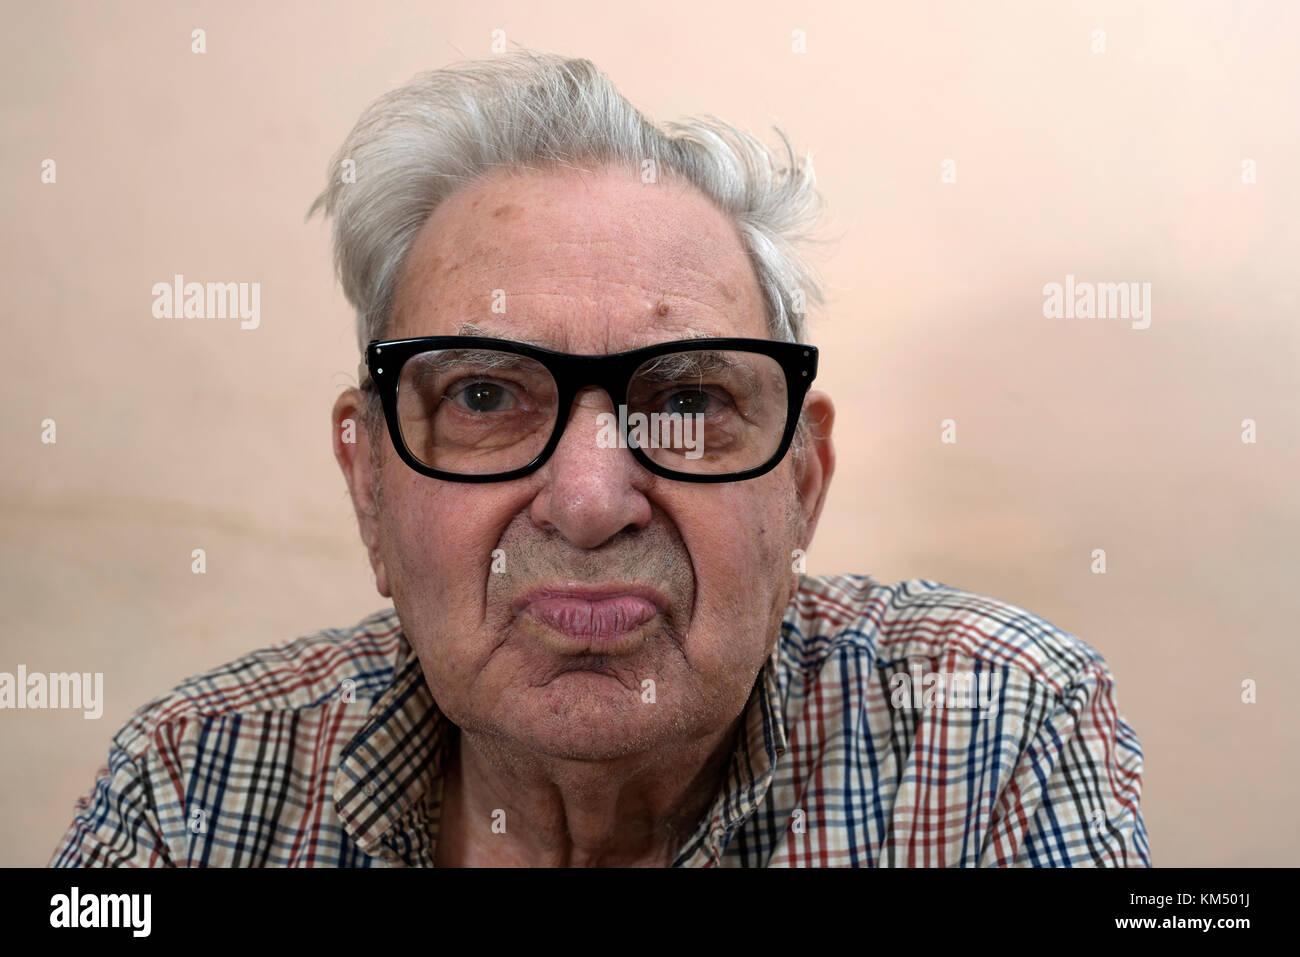 Elderly man with type 2 diabetes - Stock Image